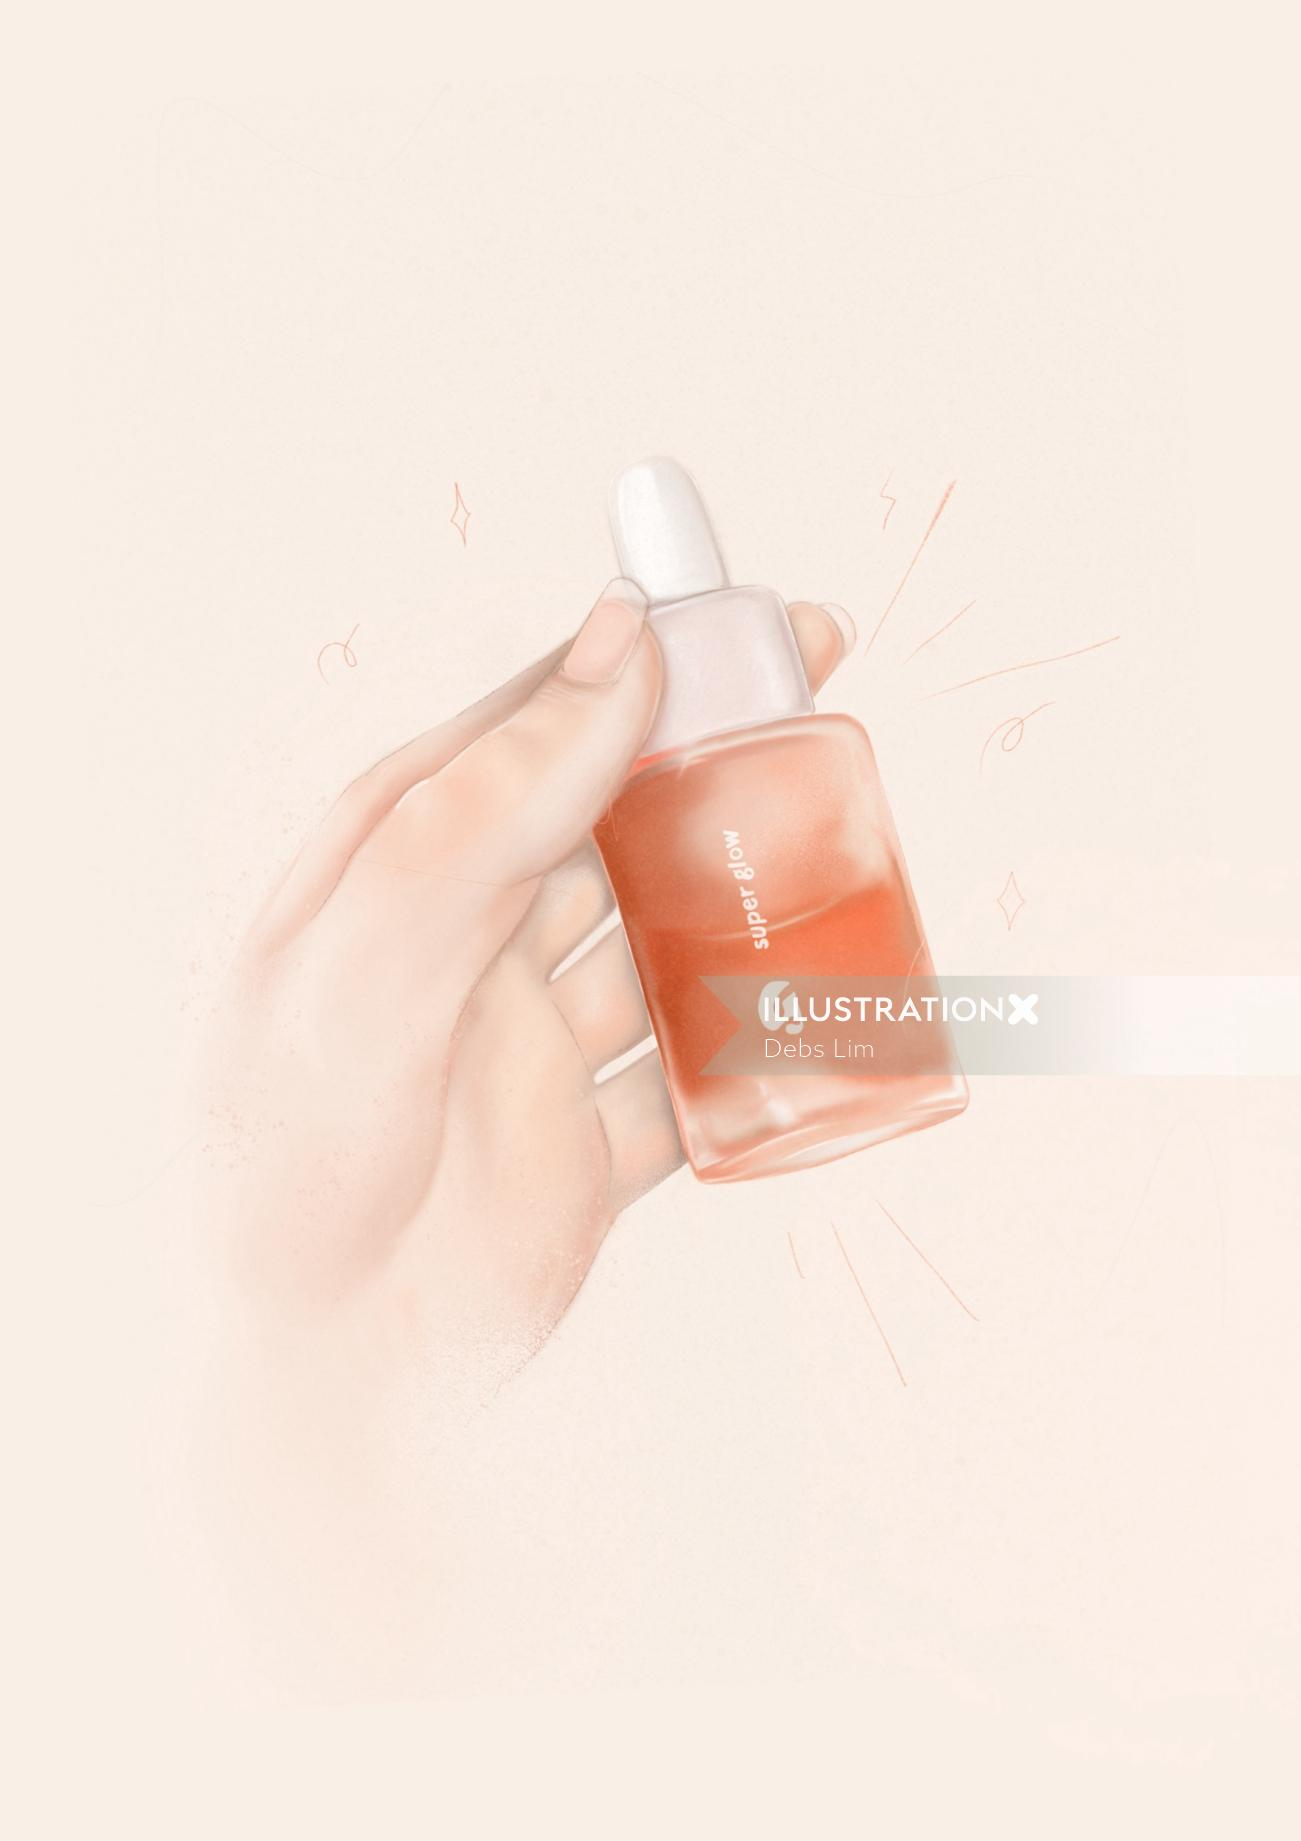 Glossier Super Glow Illustration